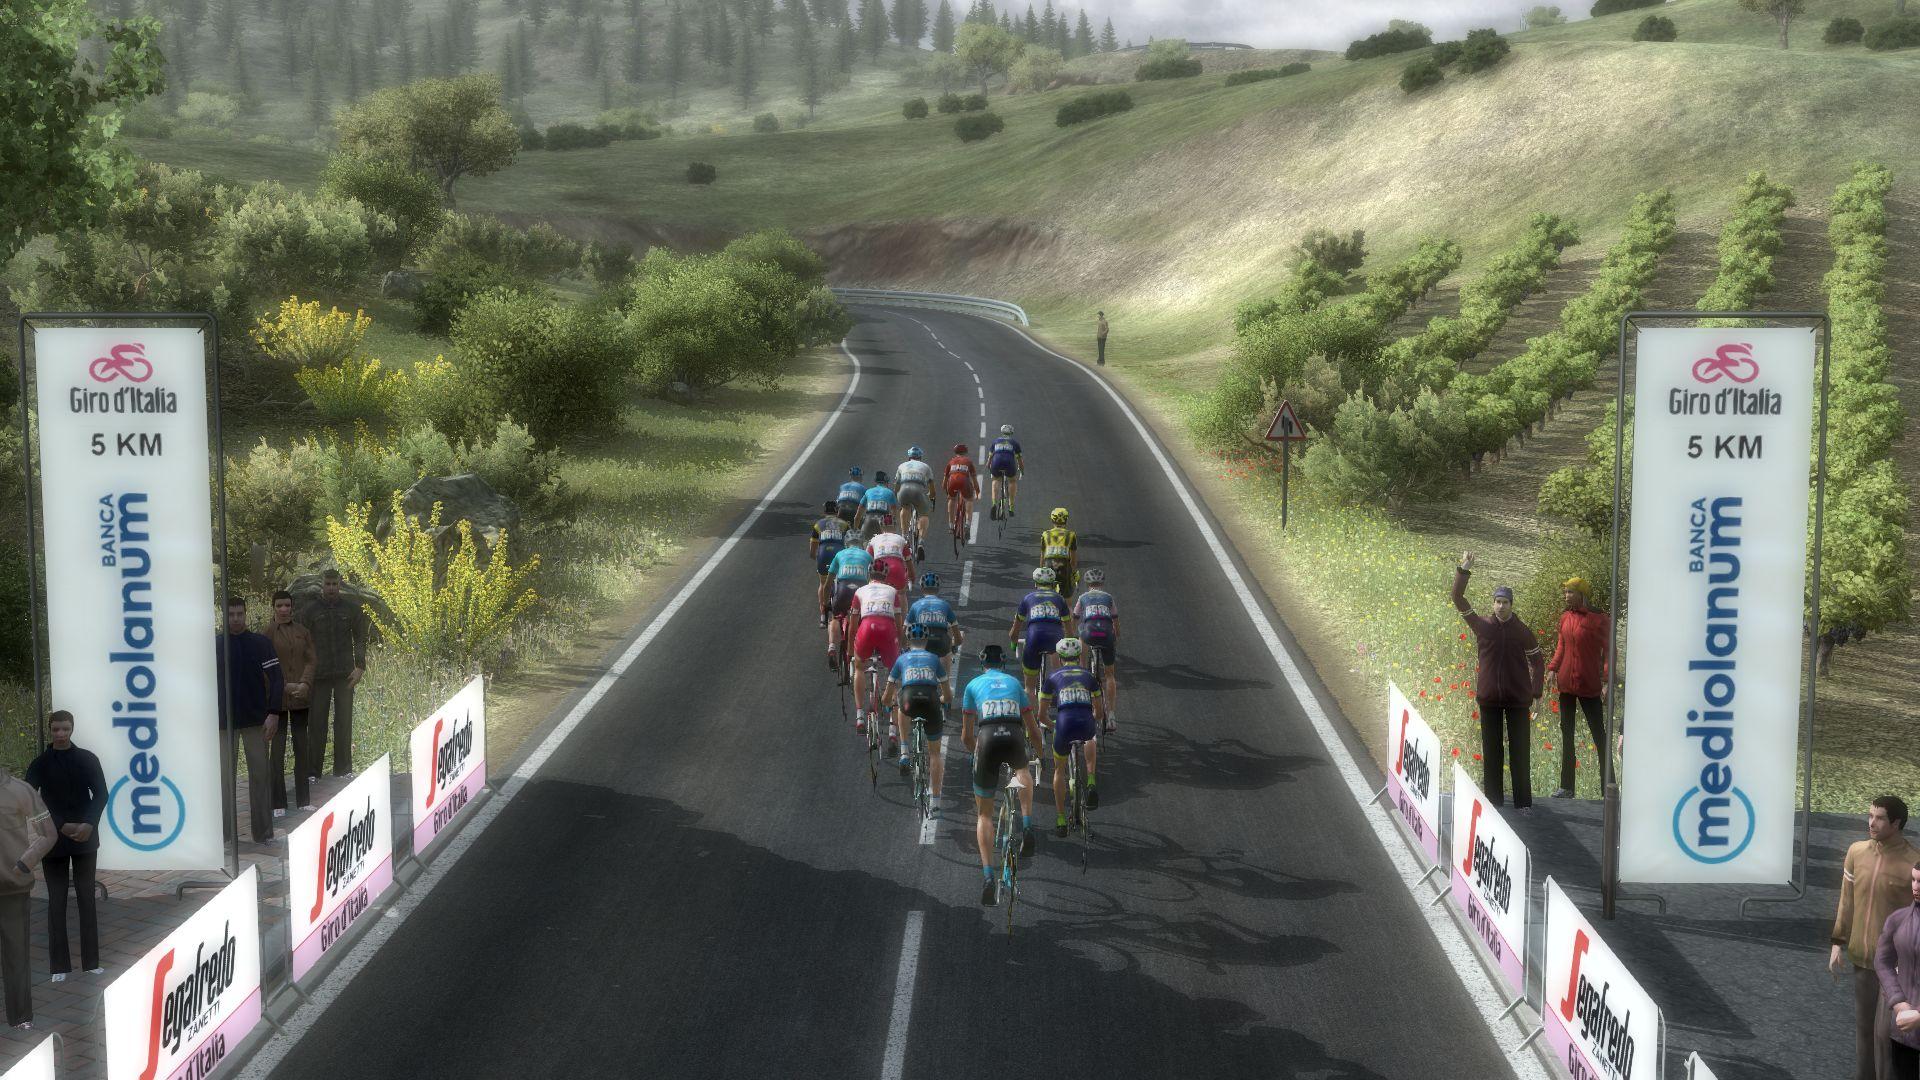 pcmdaily.com/images/mg/2020/Reports/GTM/Giro/S12/mg20_giro_s12_21.jpg